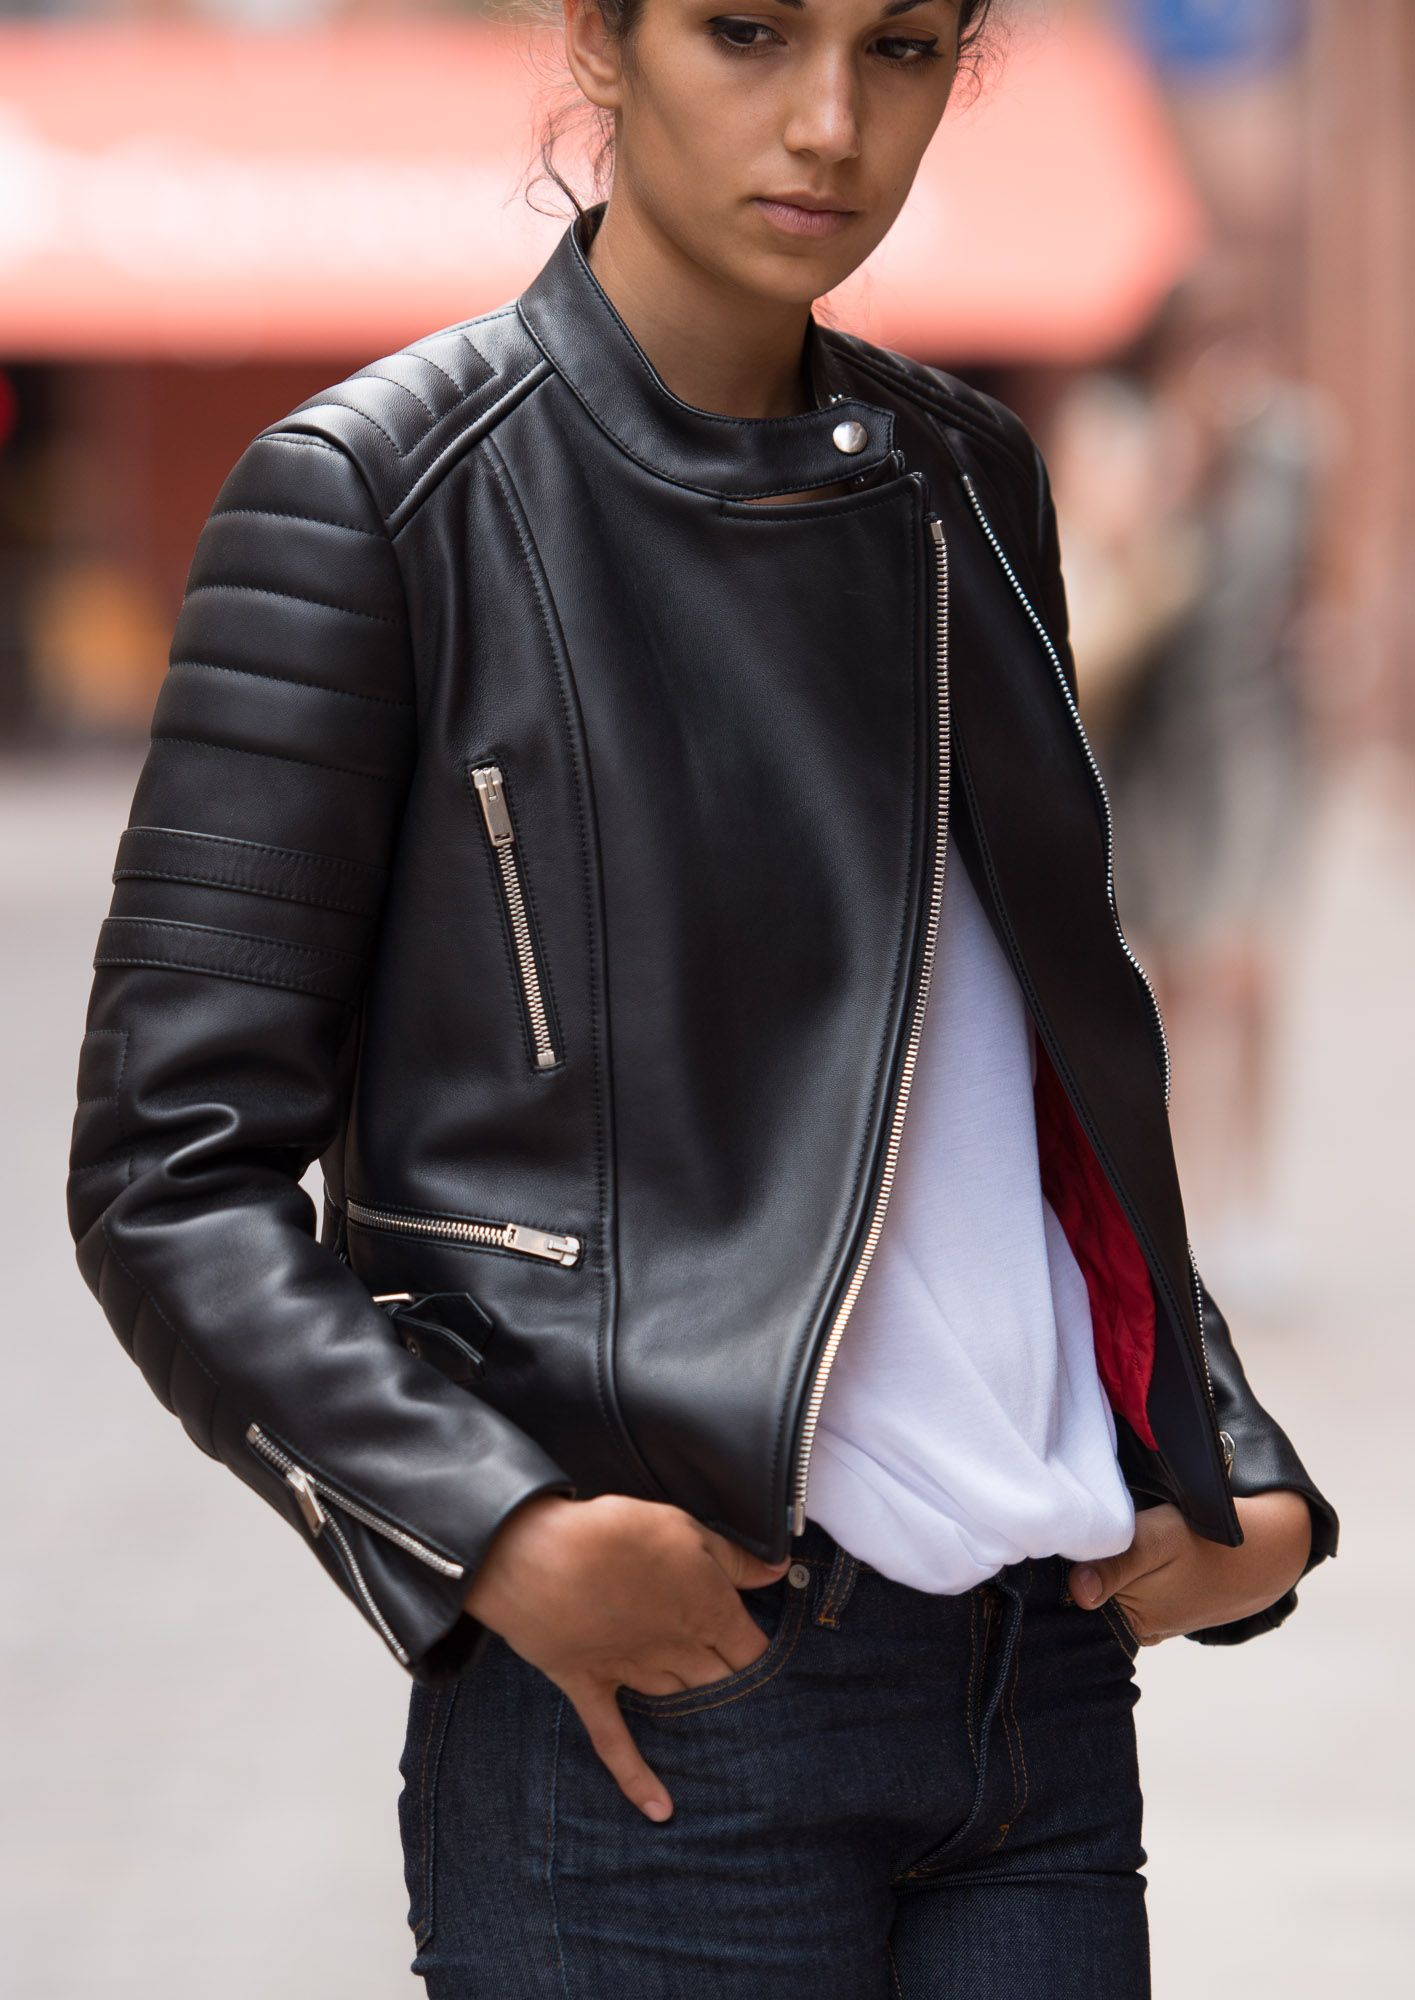 Celine Black Leather Jacket Rocker Chic Fashion Style